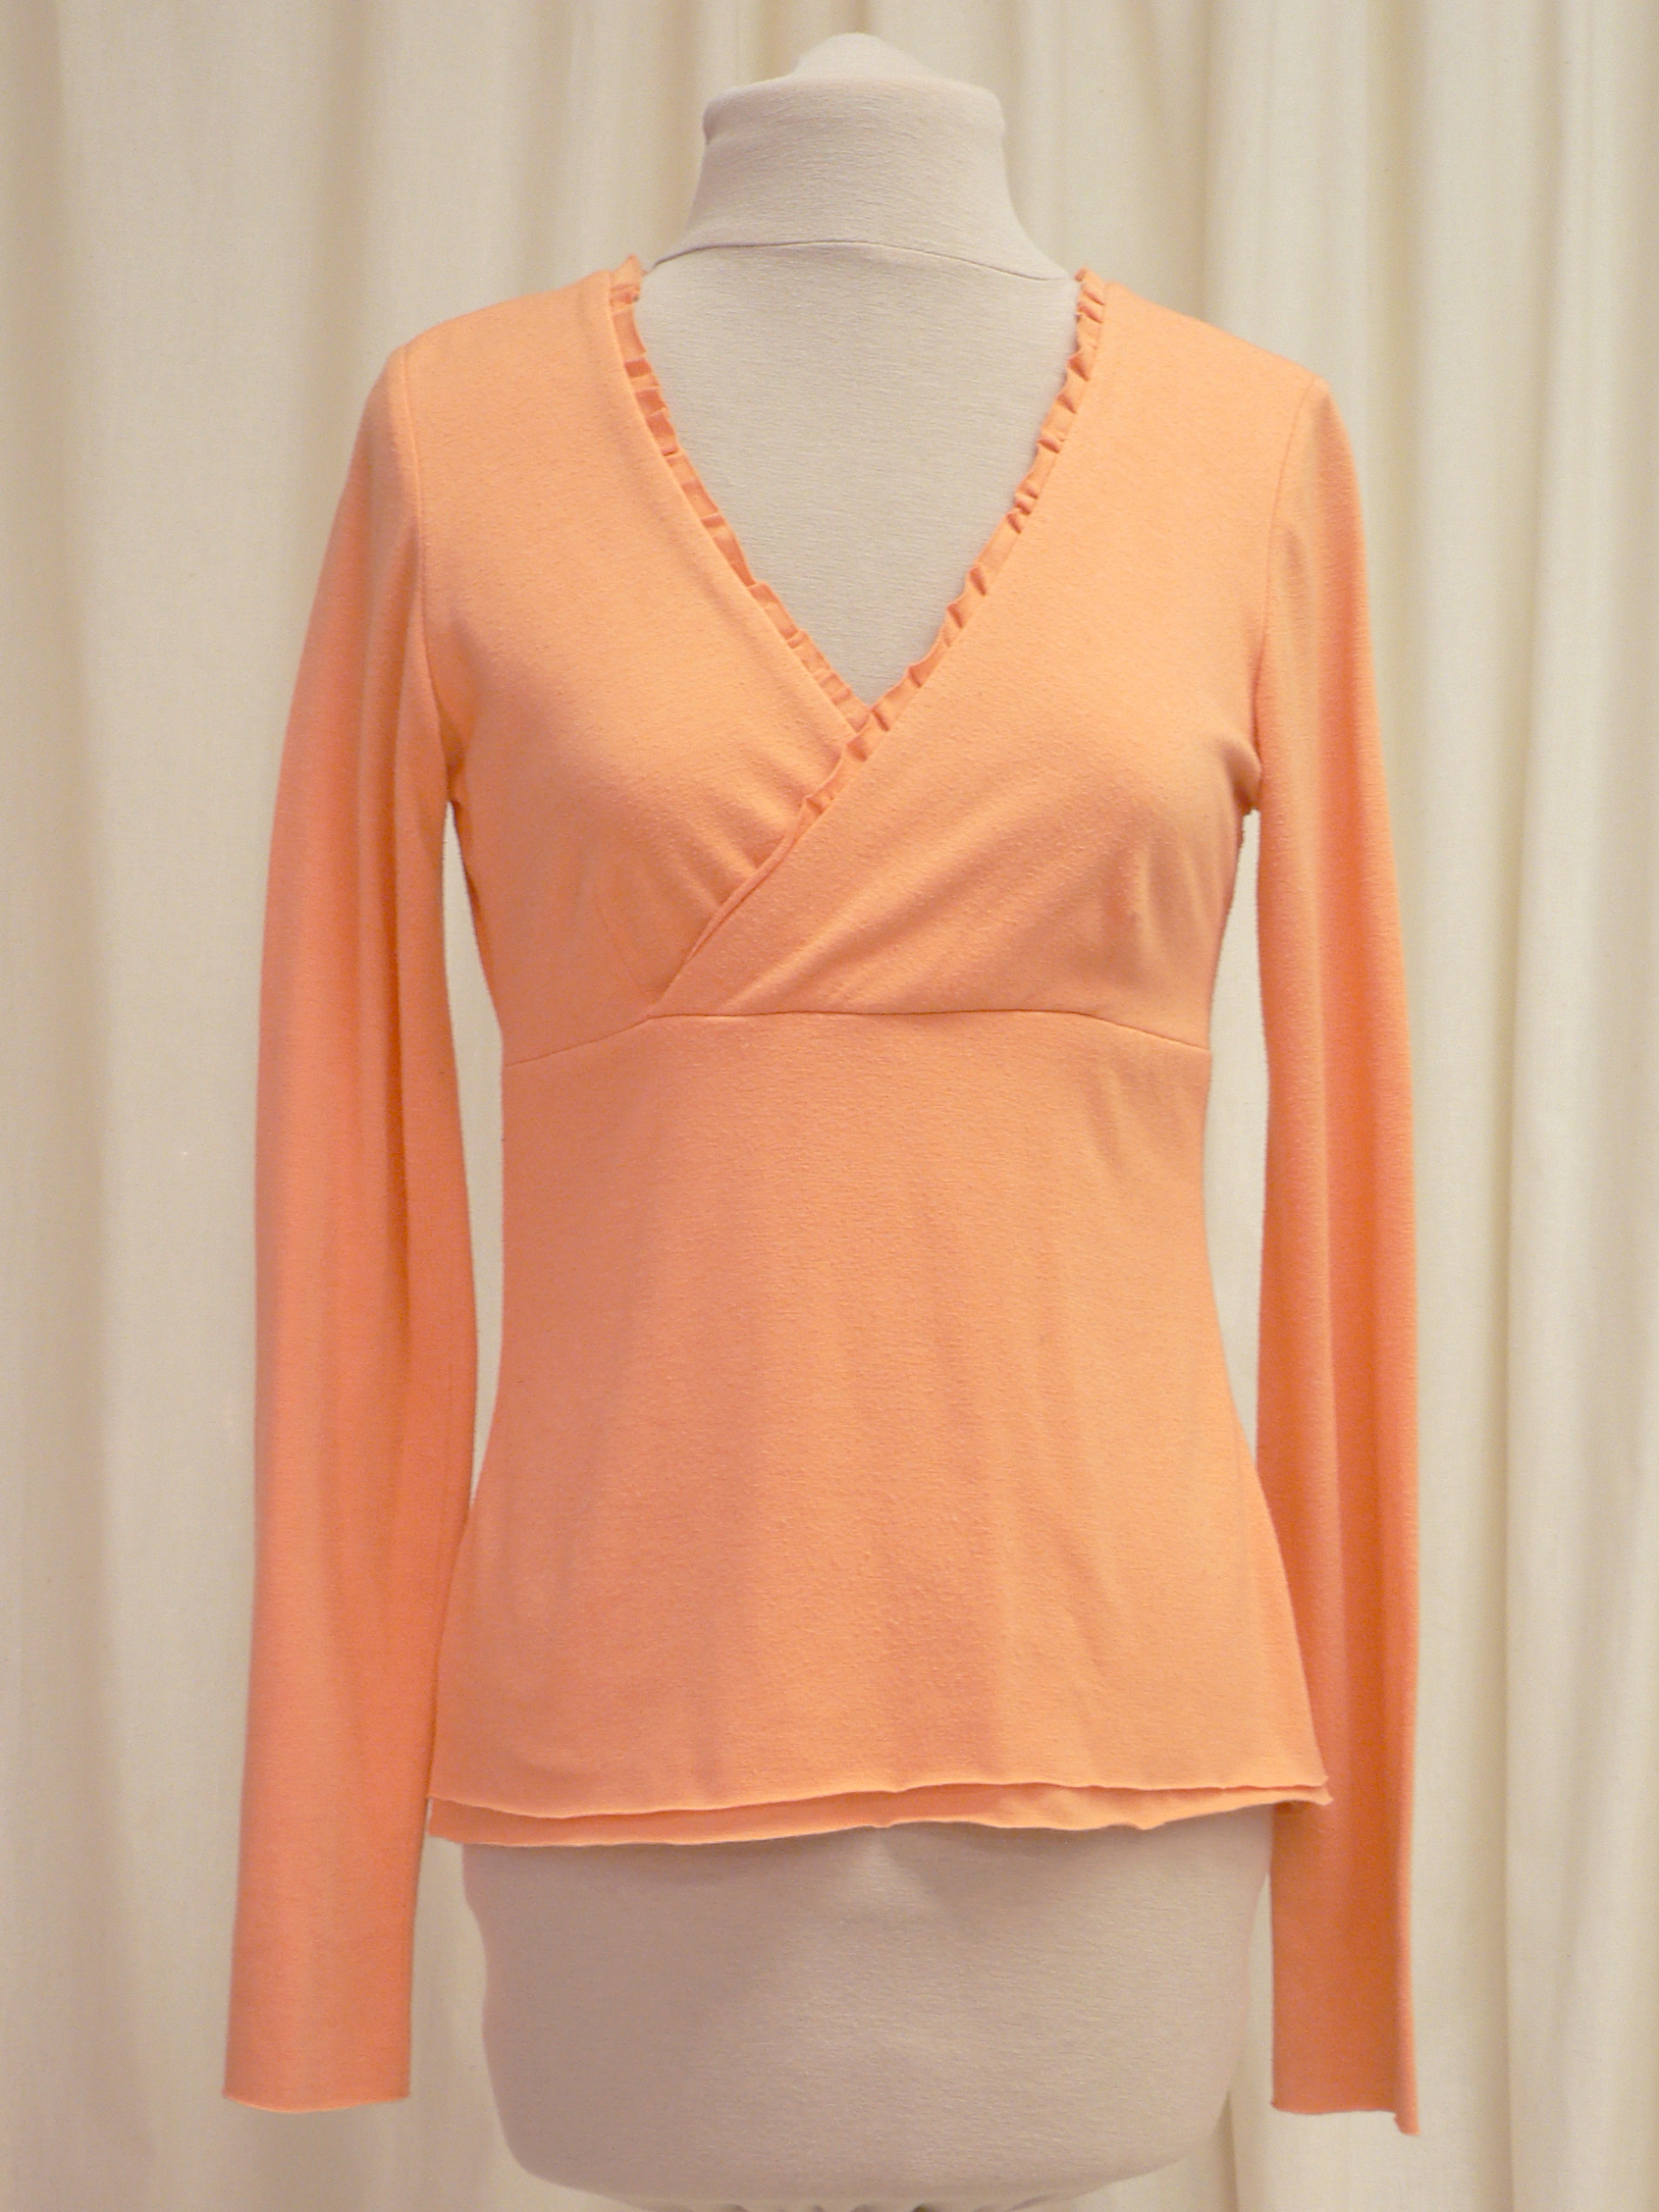 blouse03_front.jpg